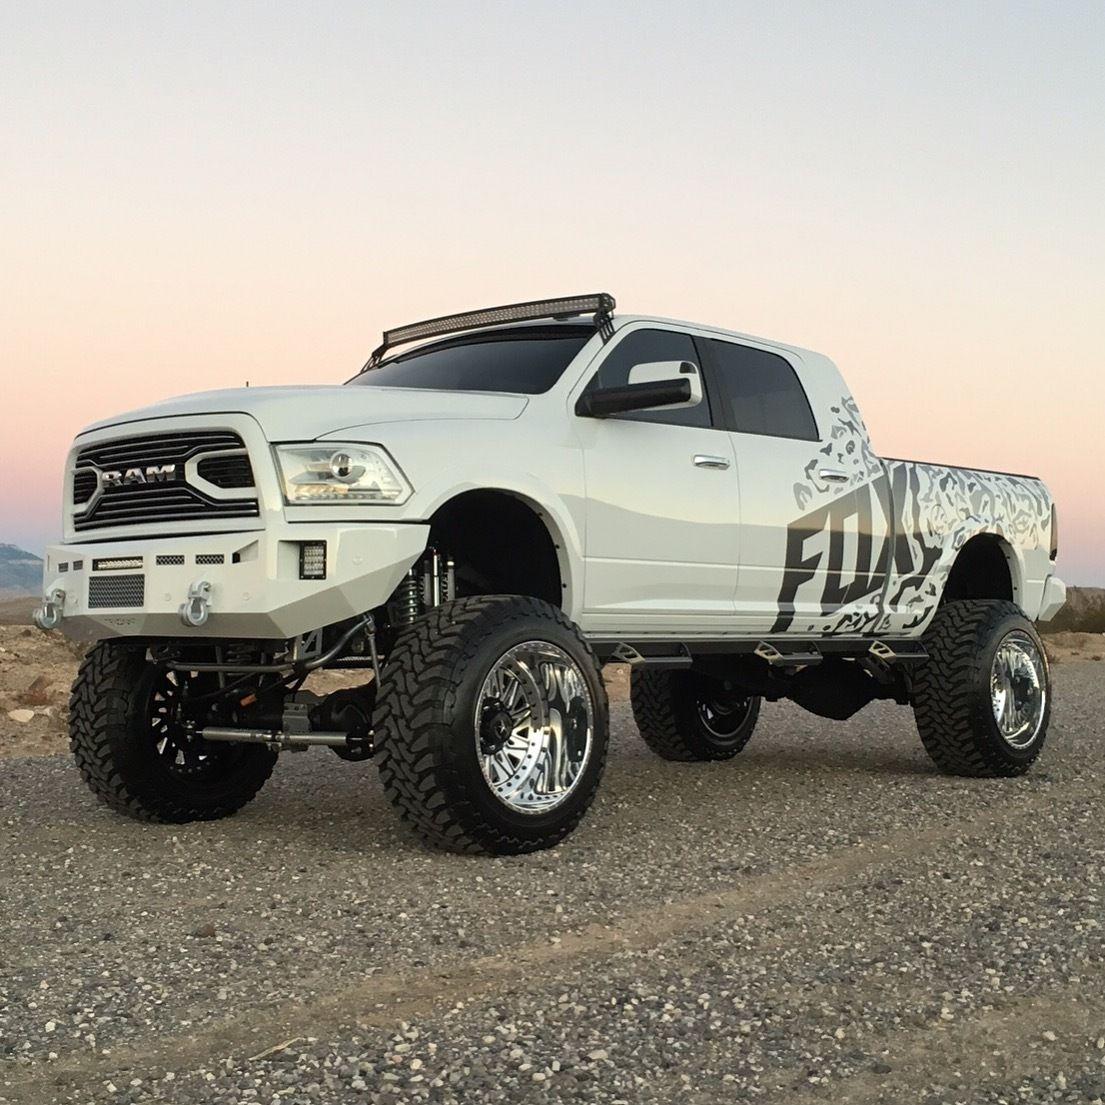 Dodge 2016 Trucks: 2015 RAM 2500 Laramie Lifted SEMA Truck